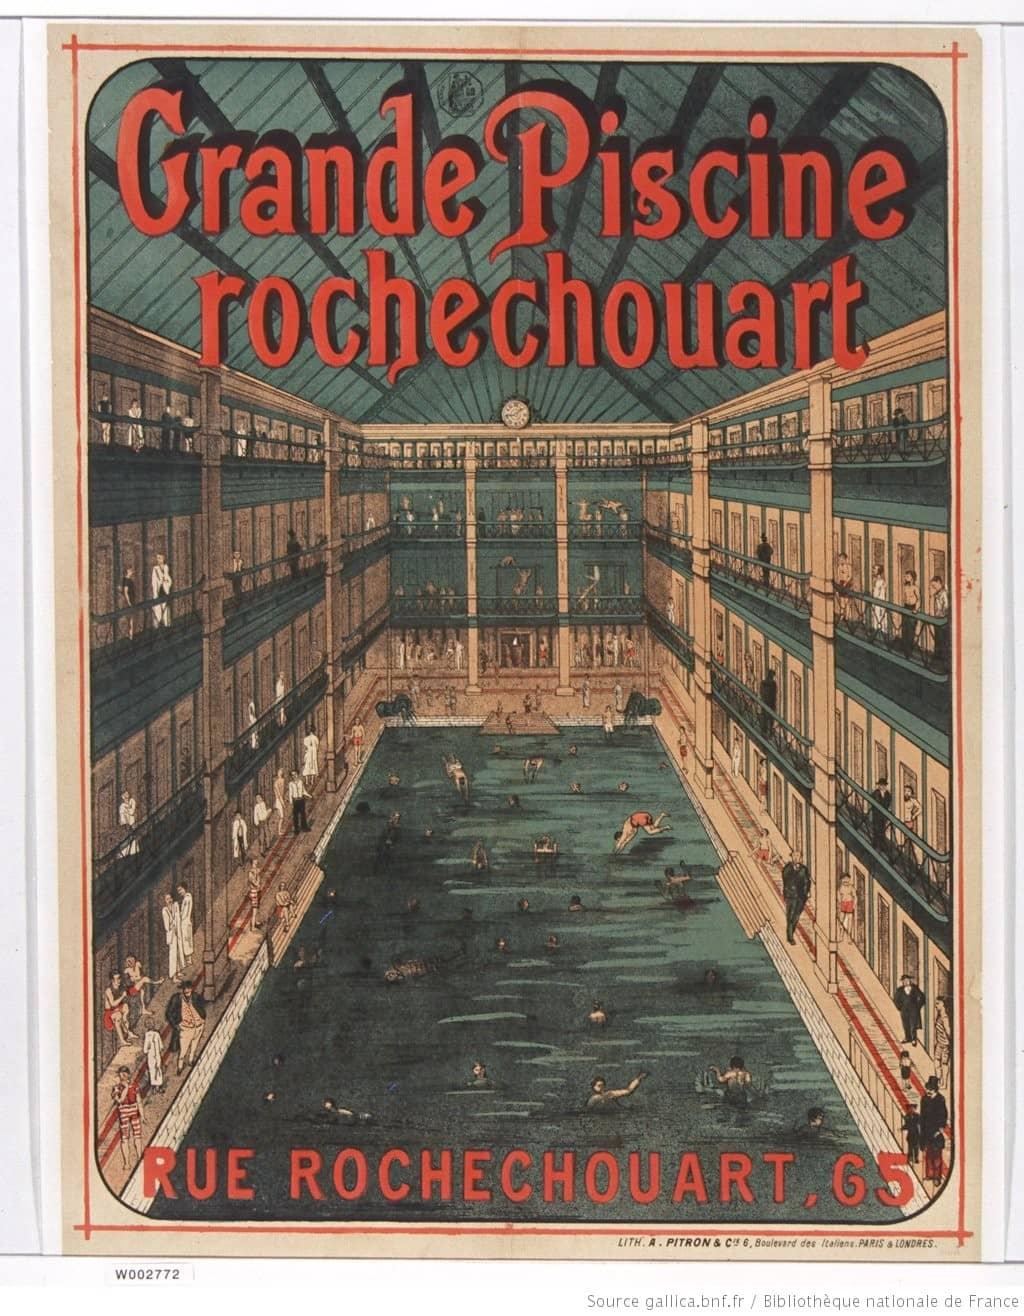 histoire de la natation - piscine de Rochechouart